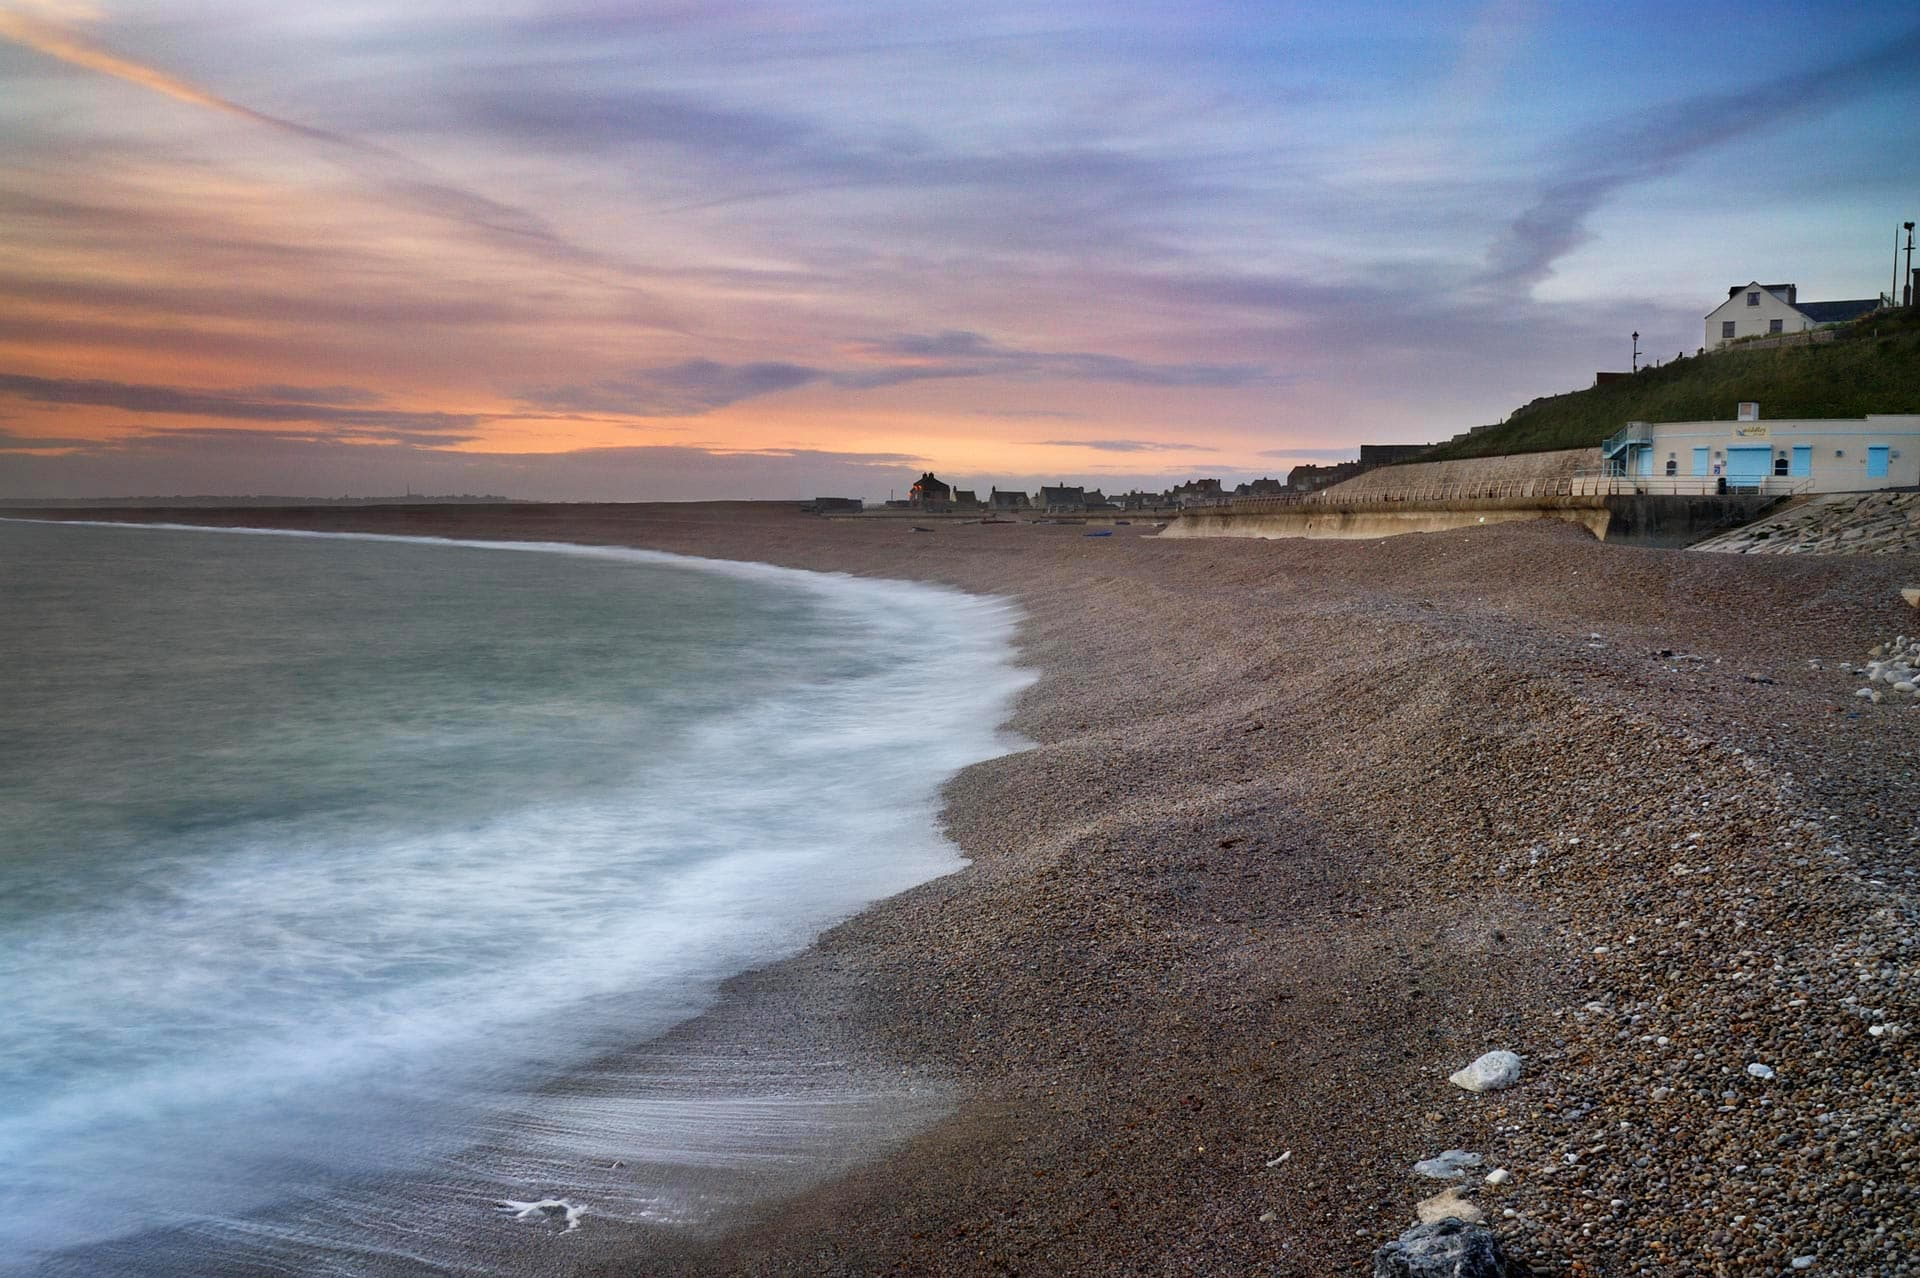 The shingle beach at Chesil beach, Isle of Purbeck, Dorset, England, UK